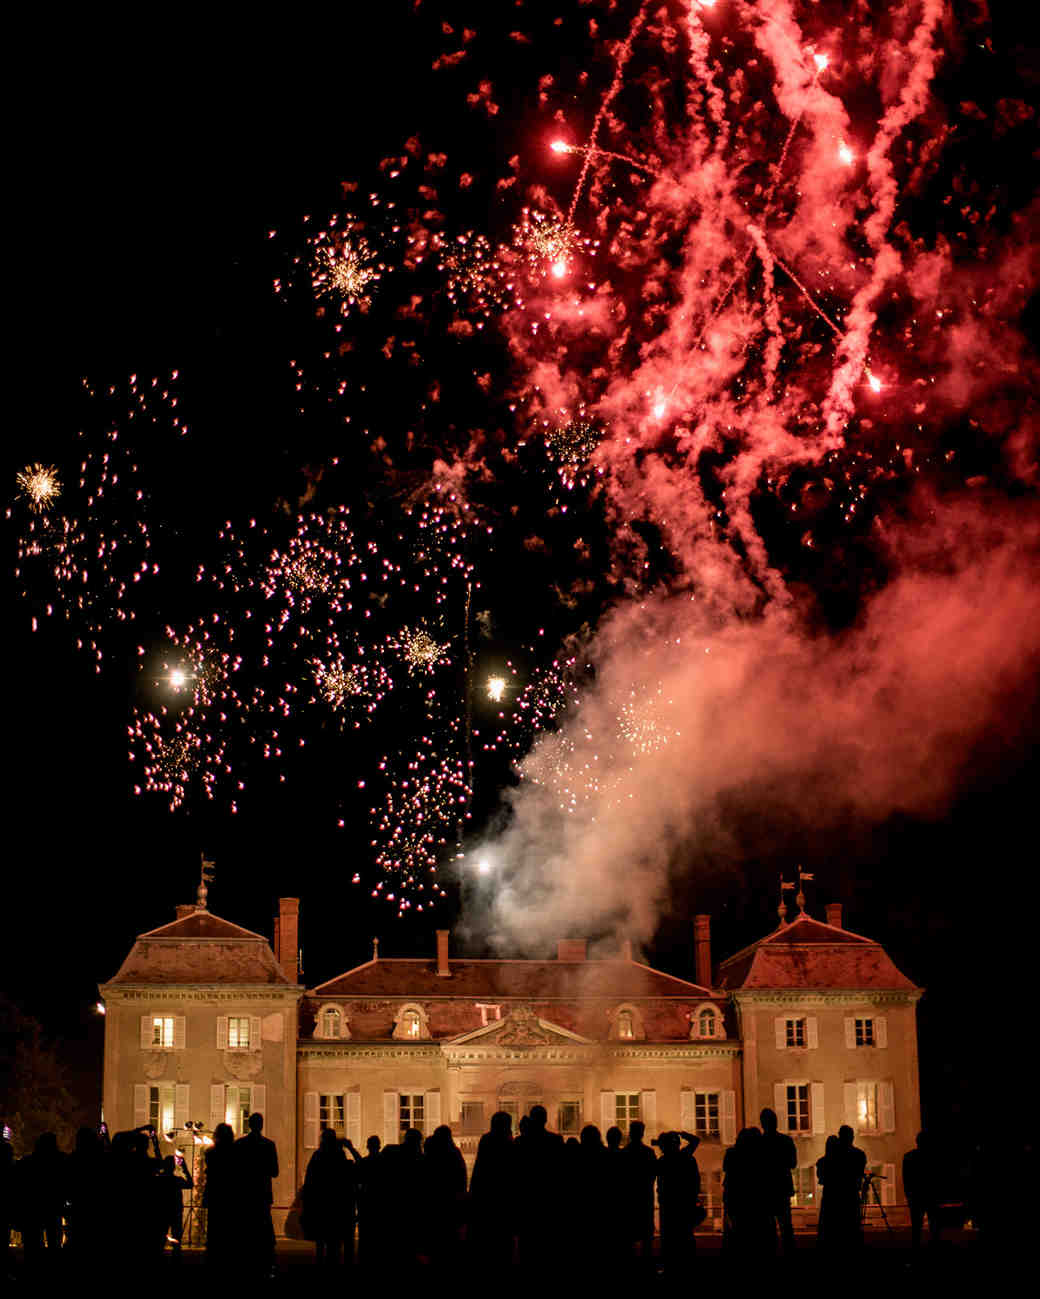 fireworks display after wedding day